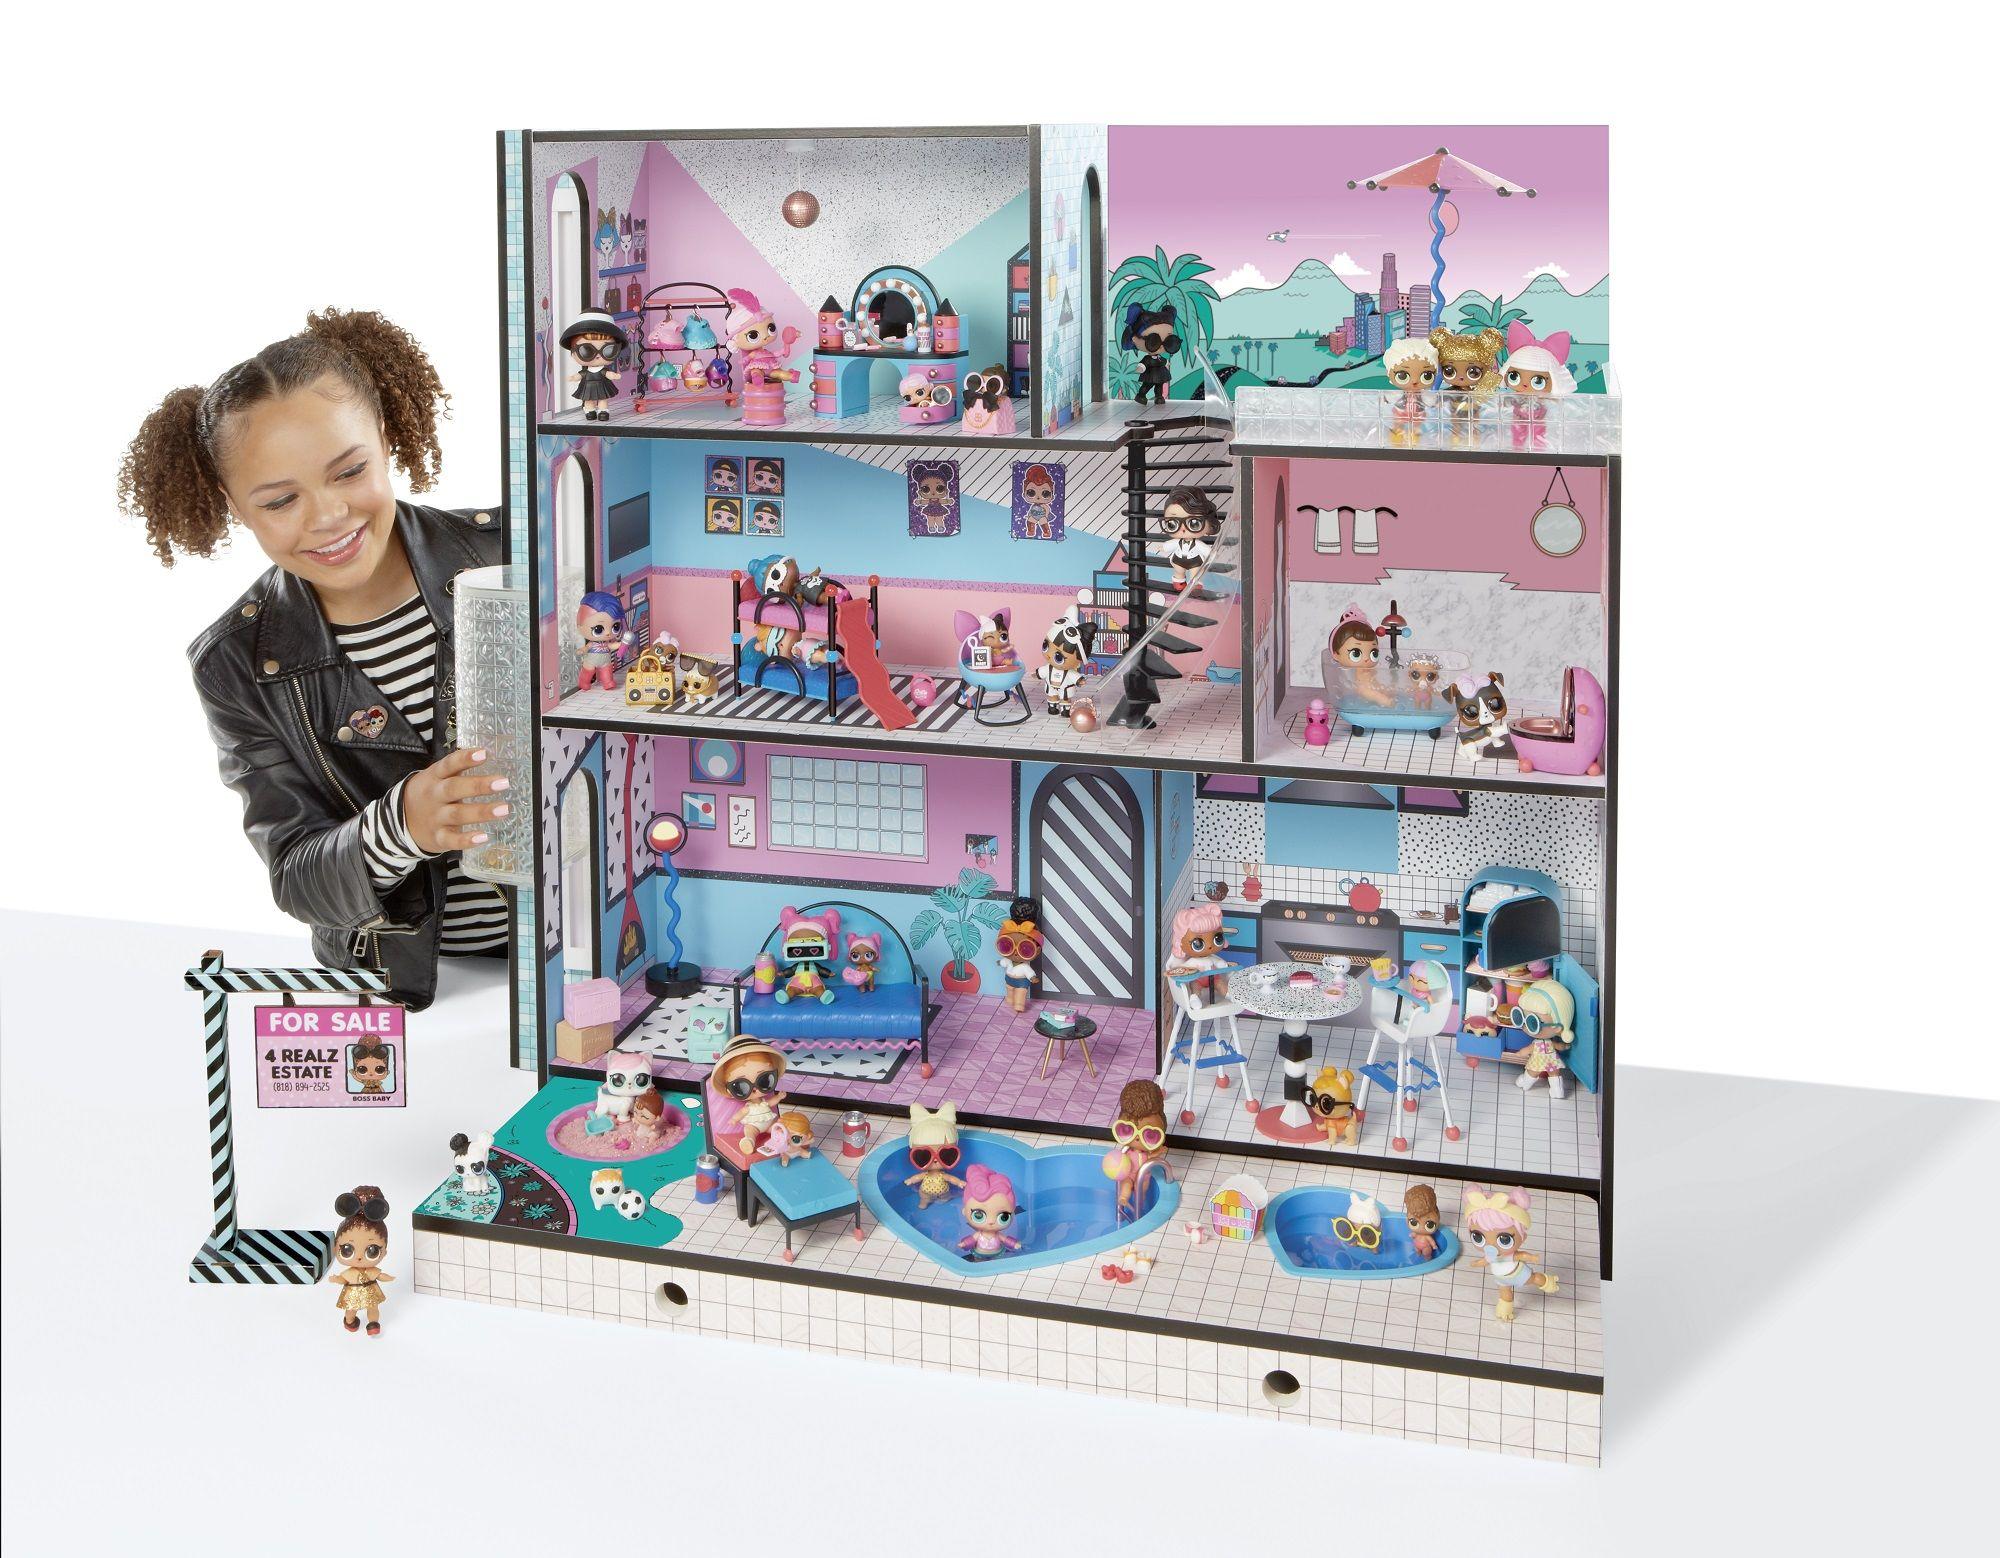 Walmart Toys For Girls : L.o.l. surprise house with 85 surprises walmart.com l.o.l.